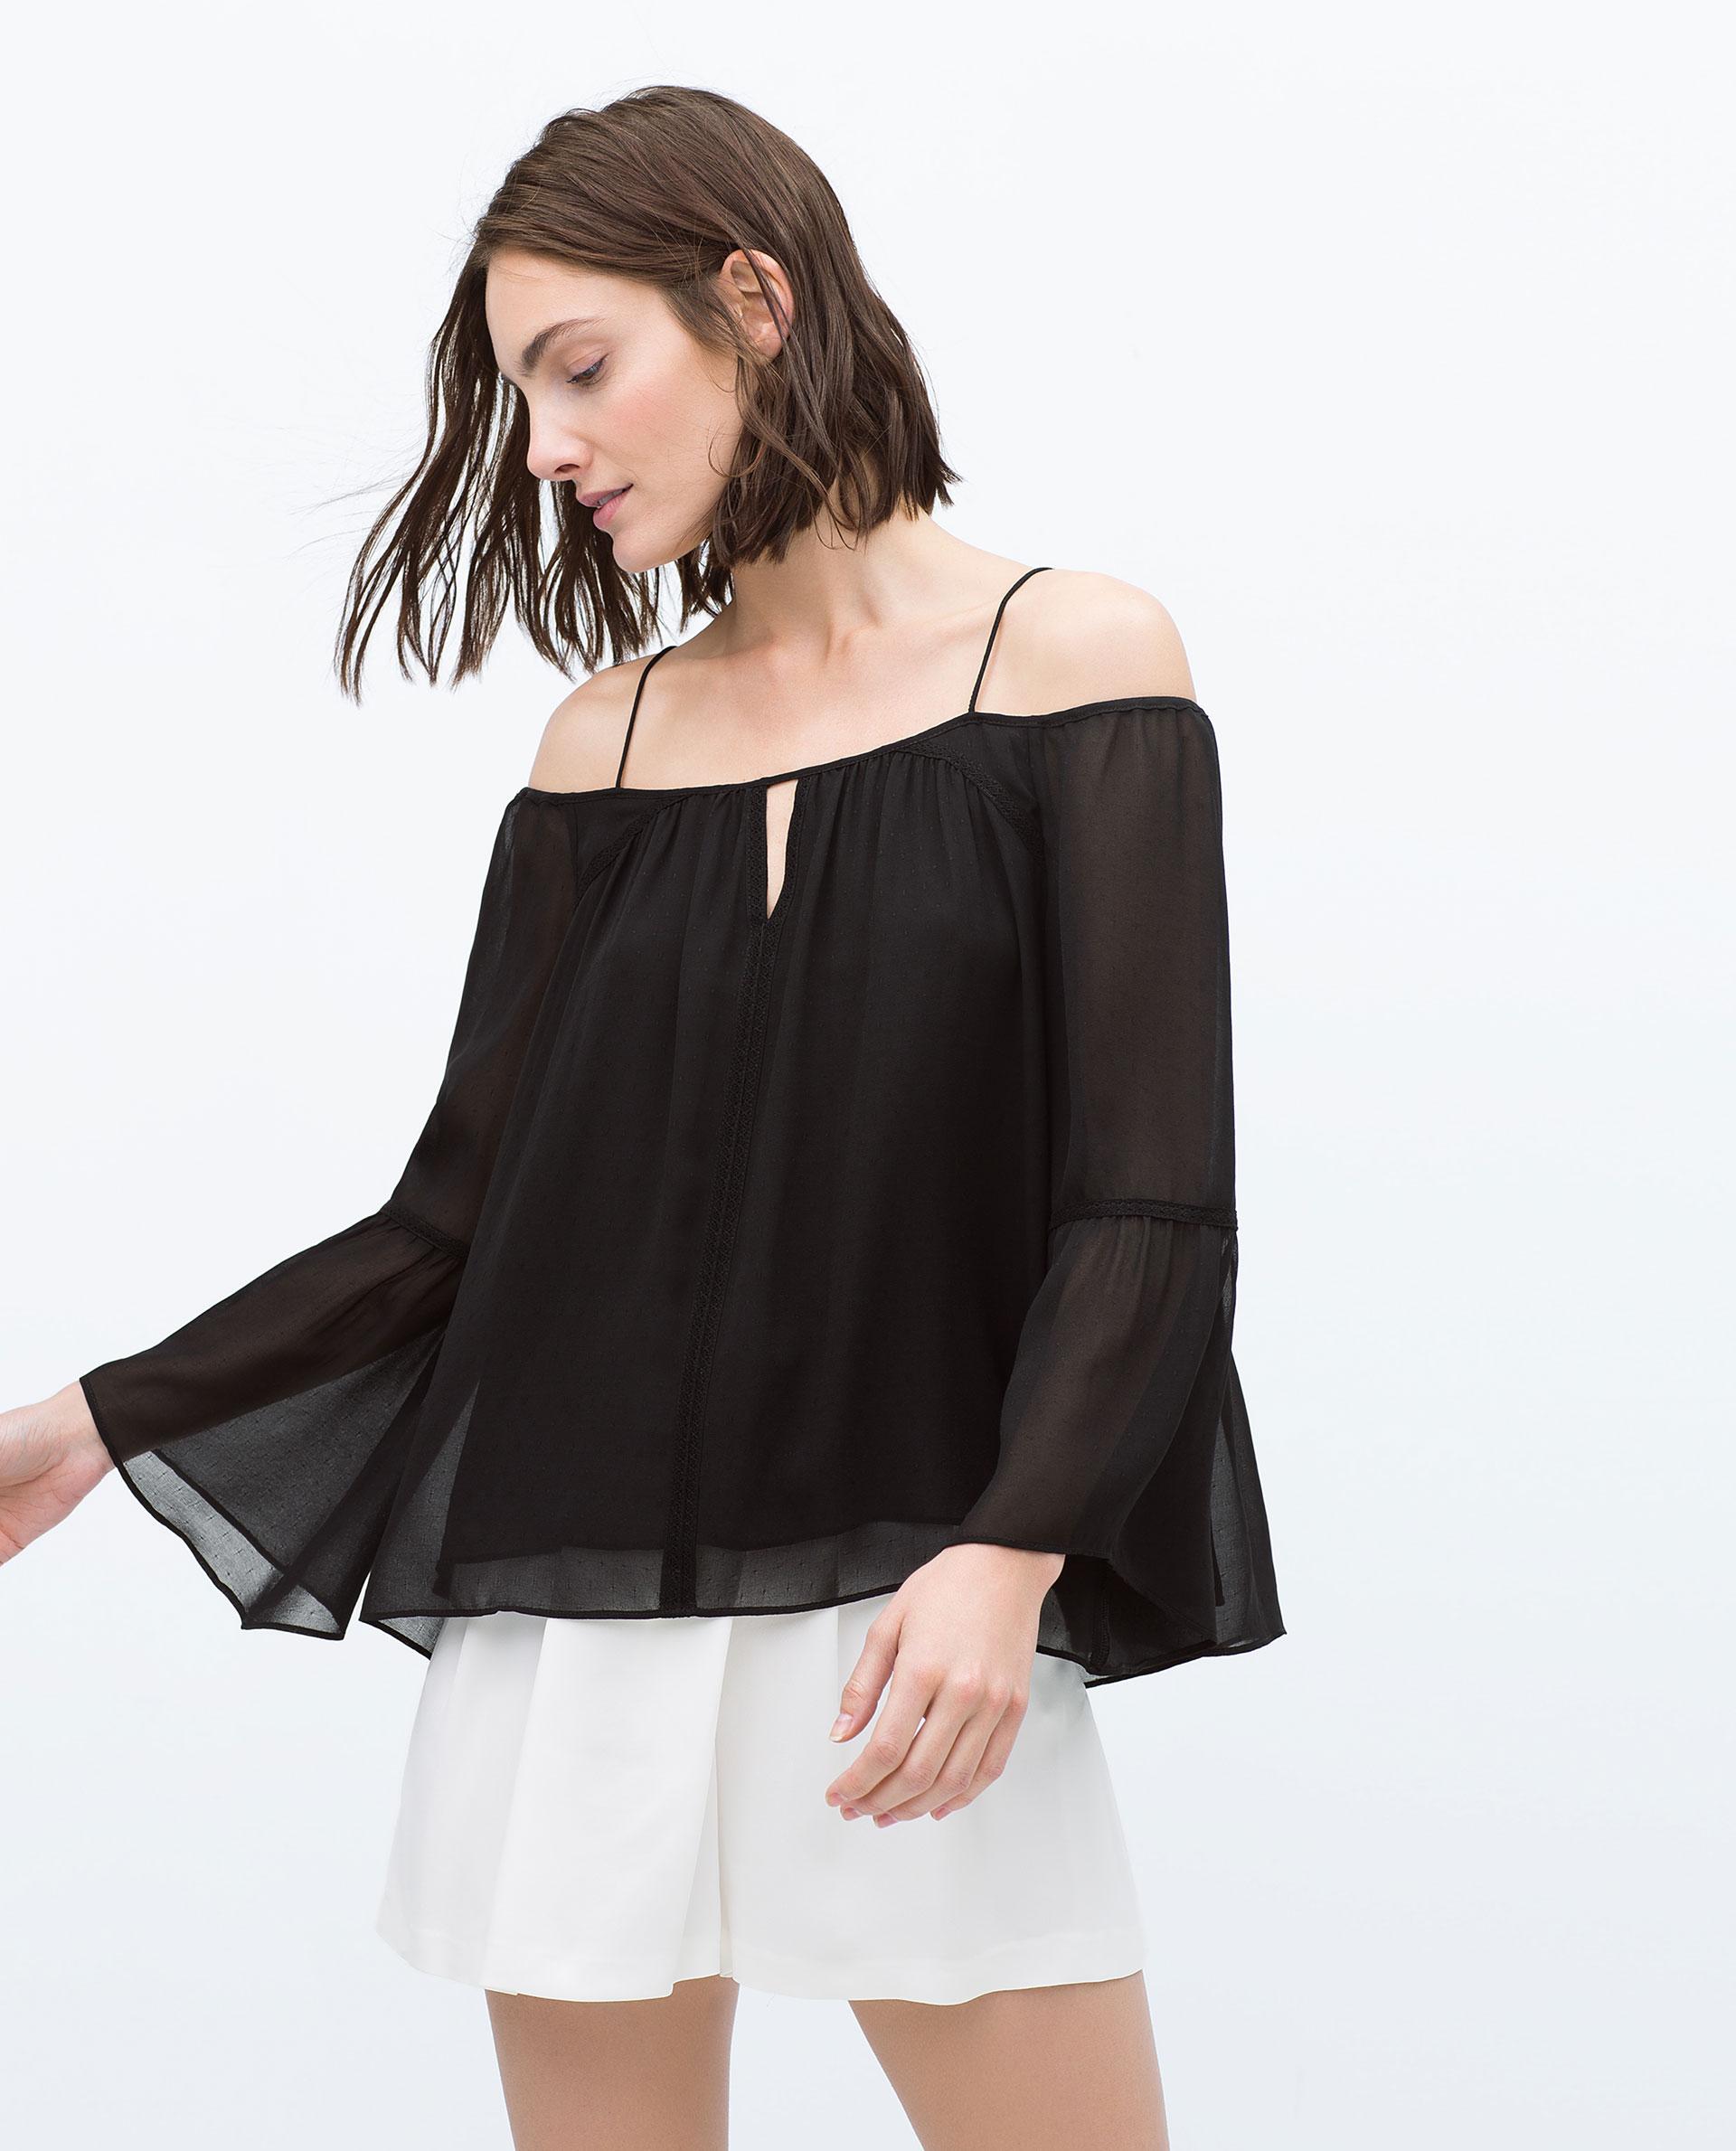 Zara Womens Blouses 39